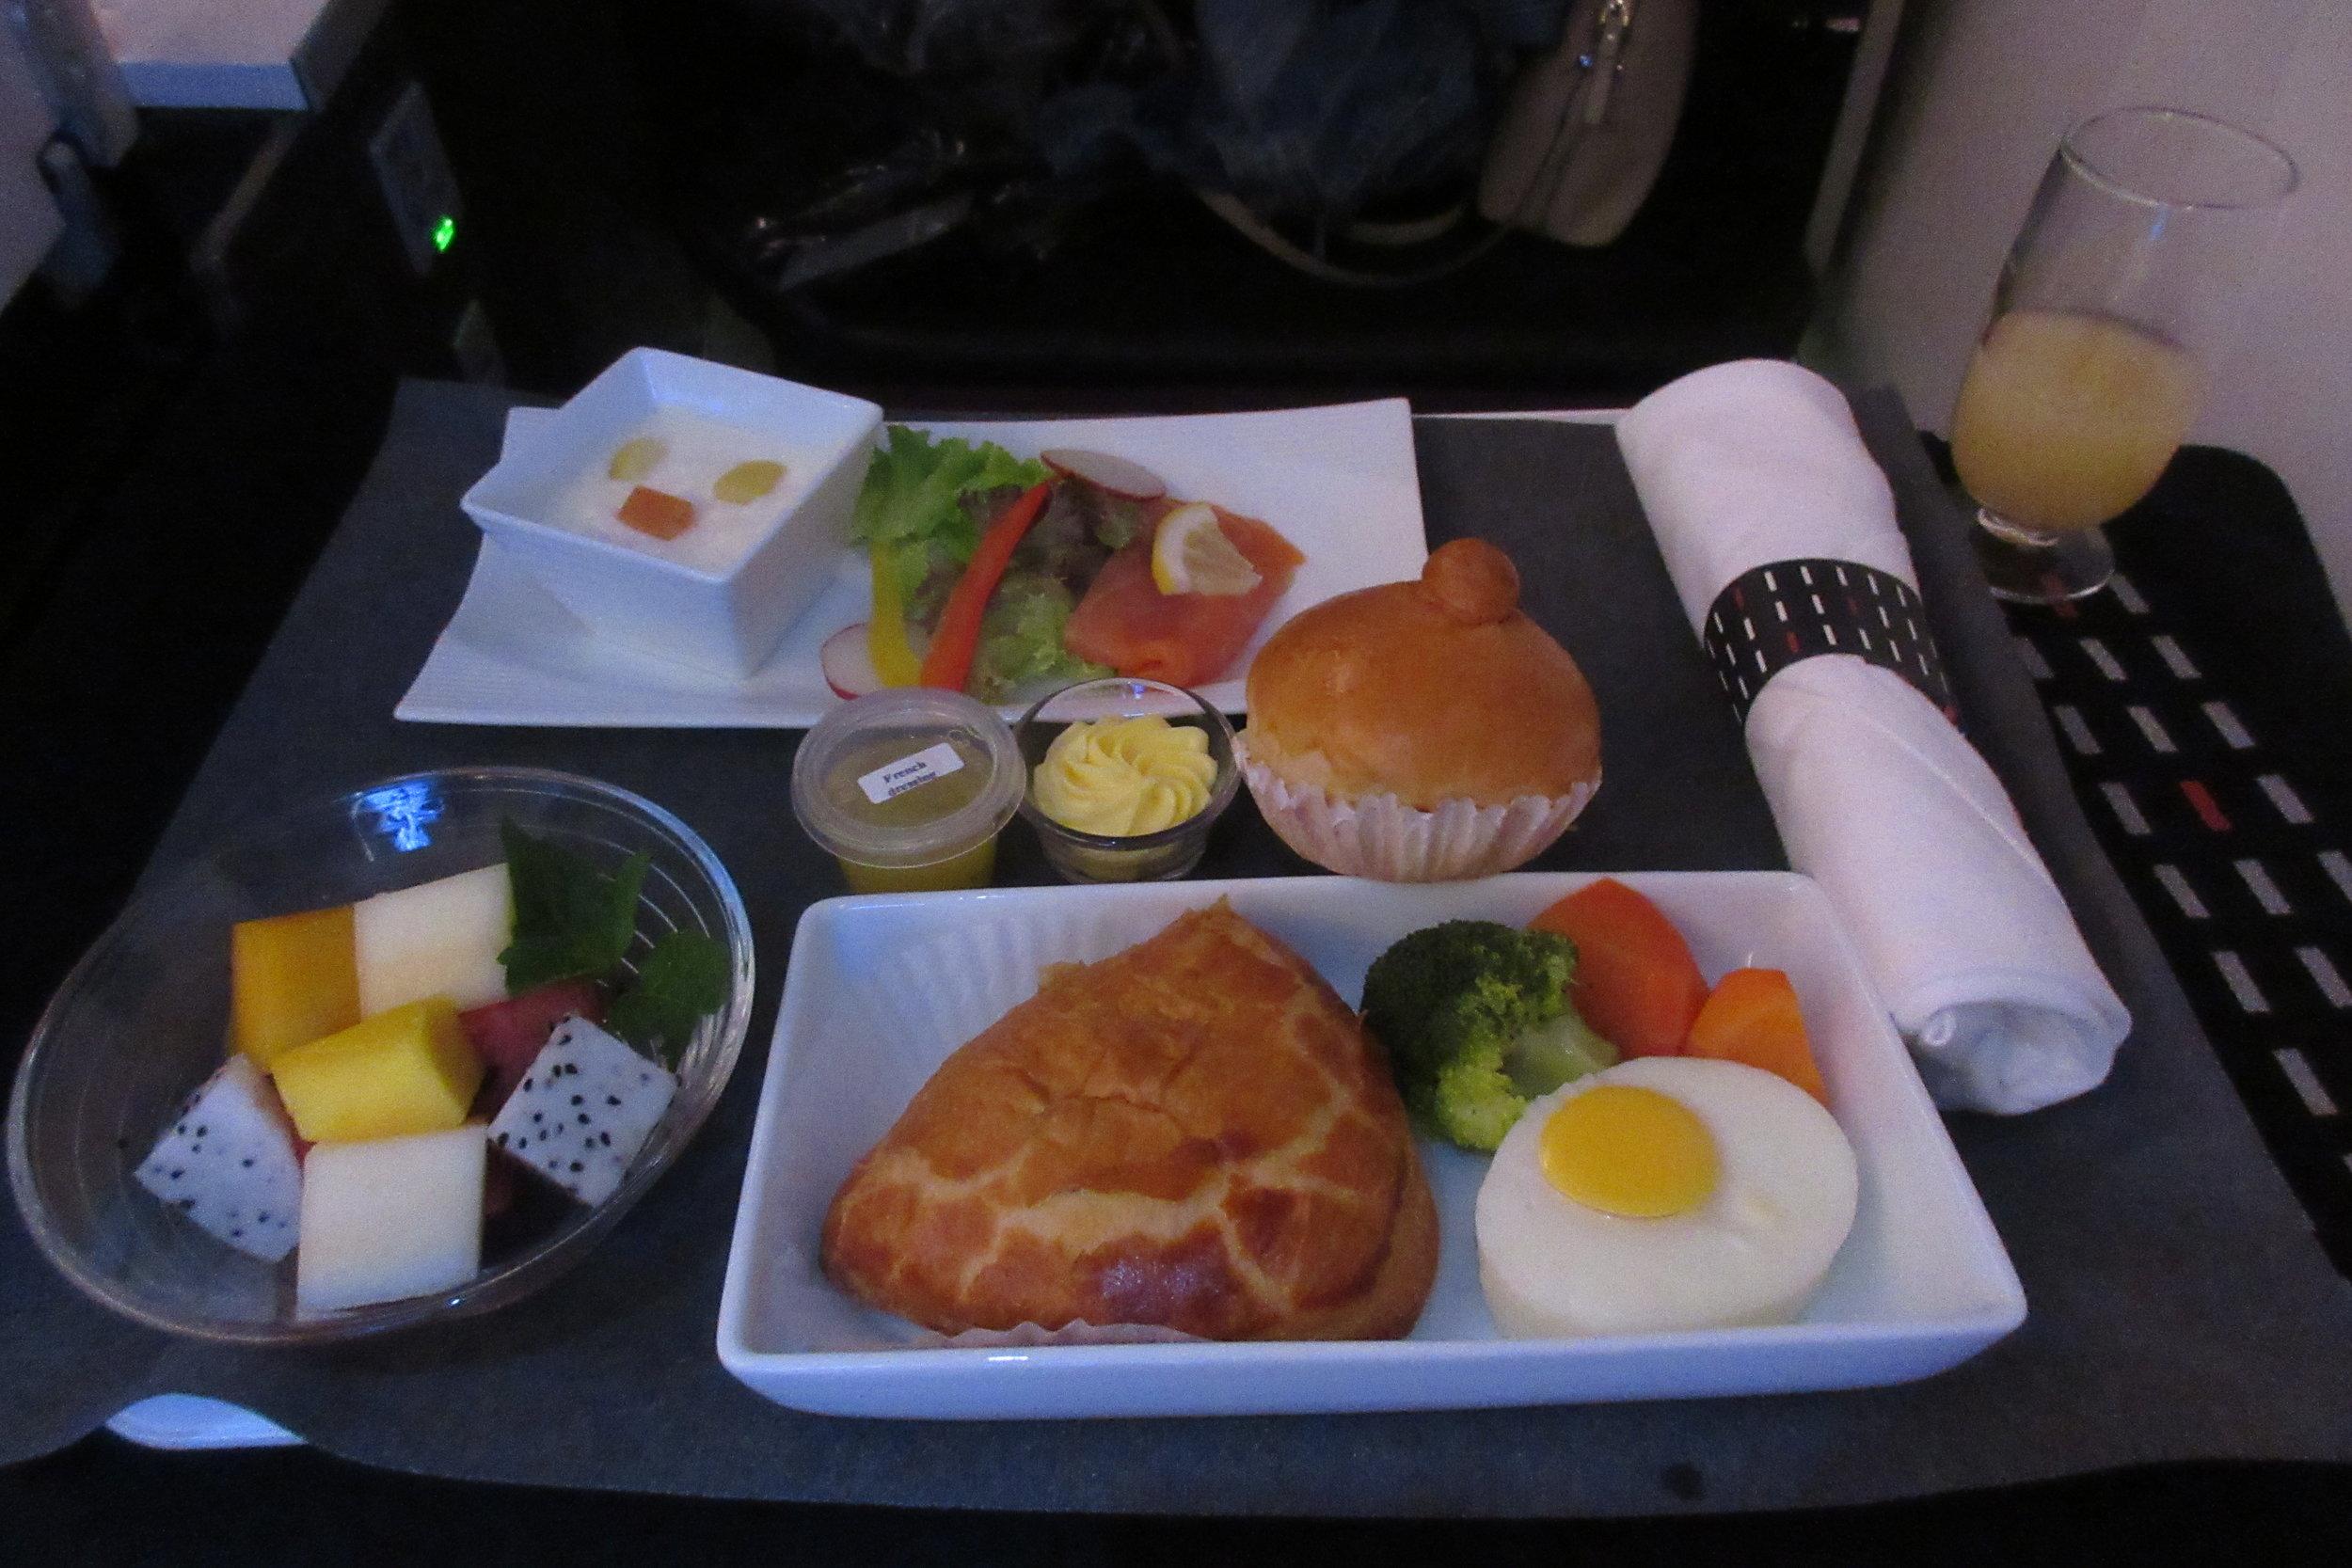 Japan Airlines business class – Western breakfast